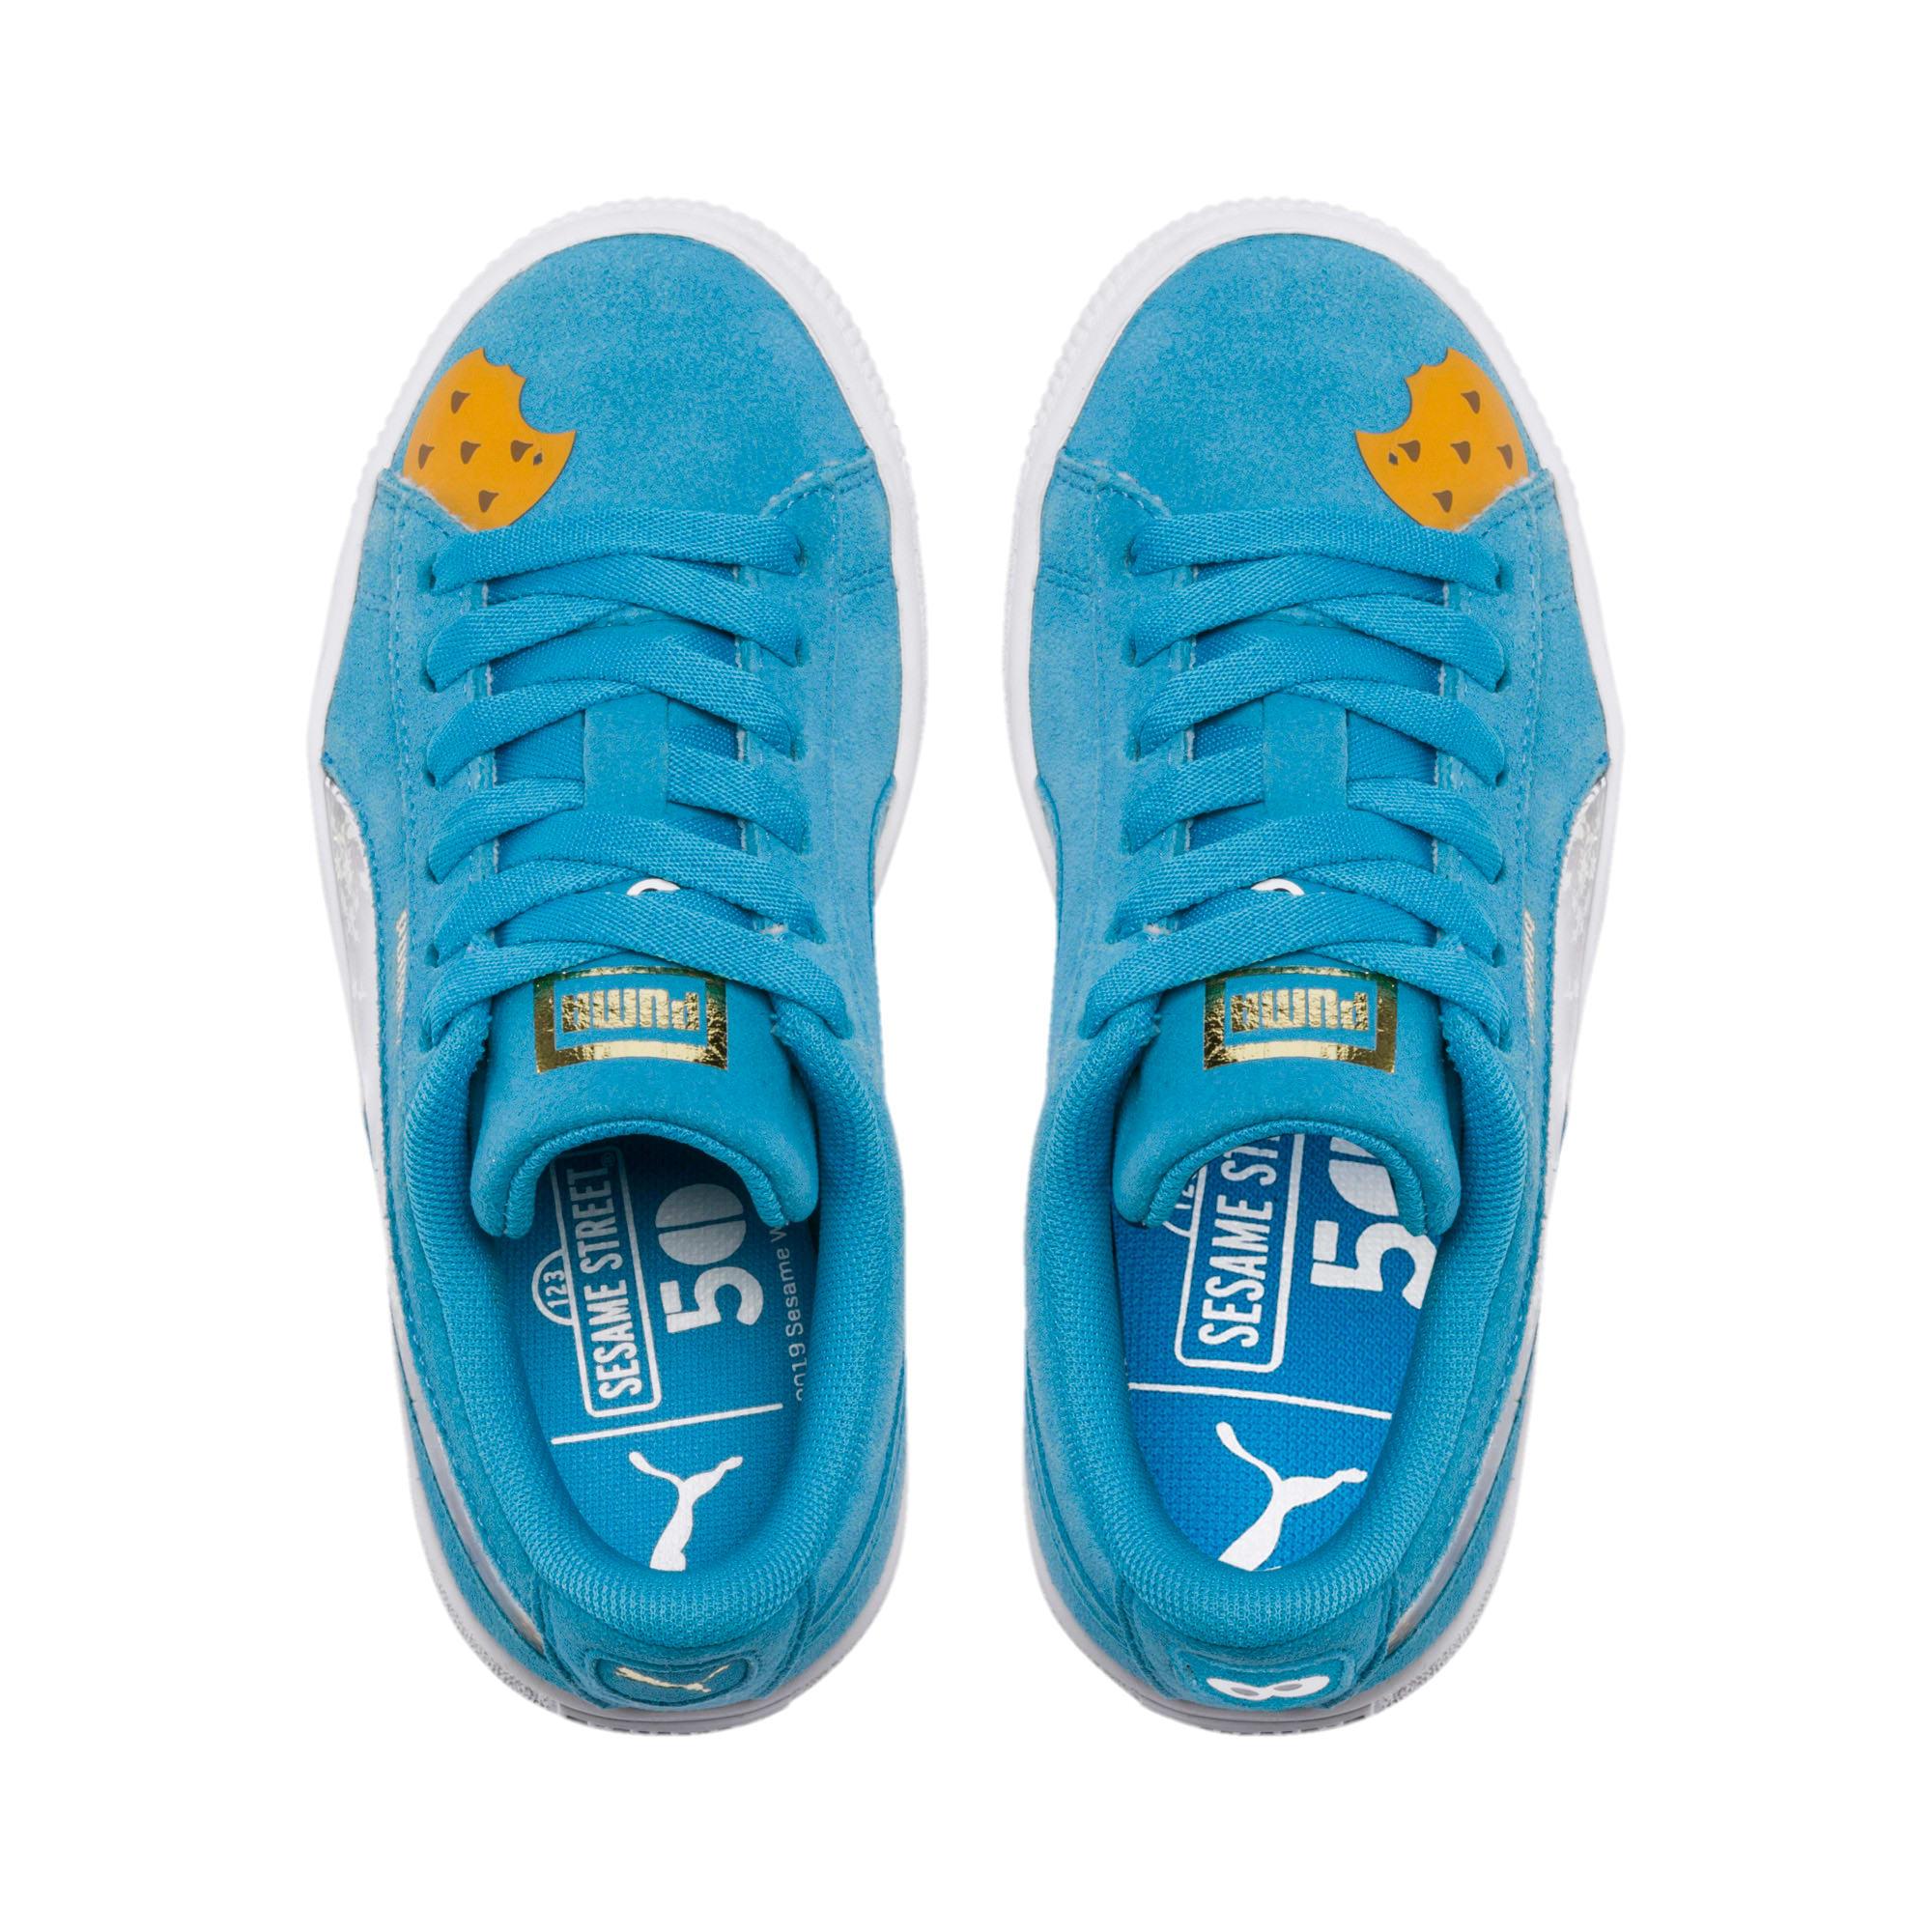 Thumbnail 6 of Sesamstraße 50 Suede Statement Kids Sneaker, Bleu Azur-Puma White, medium